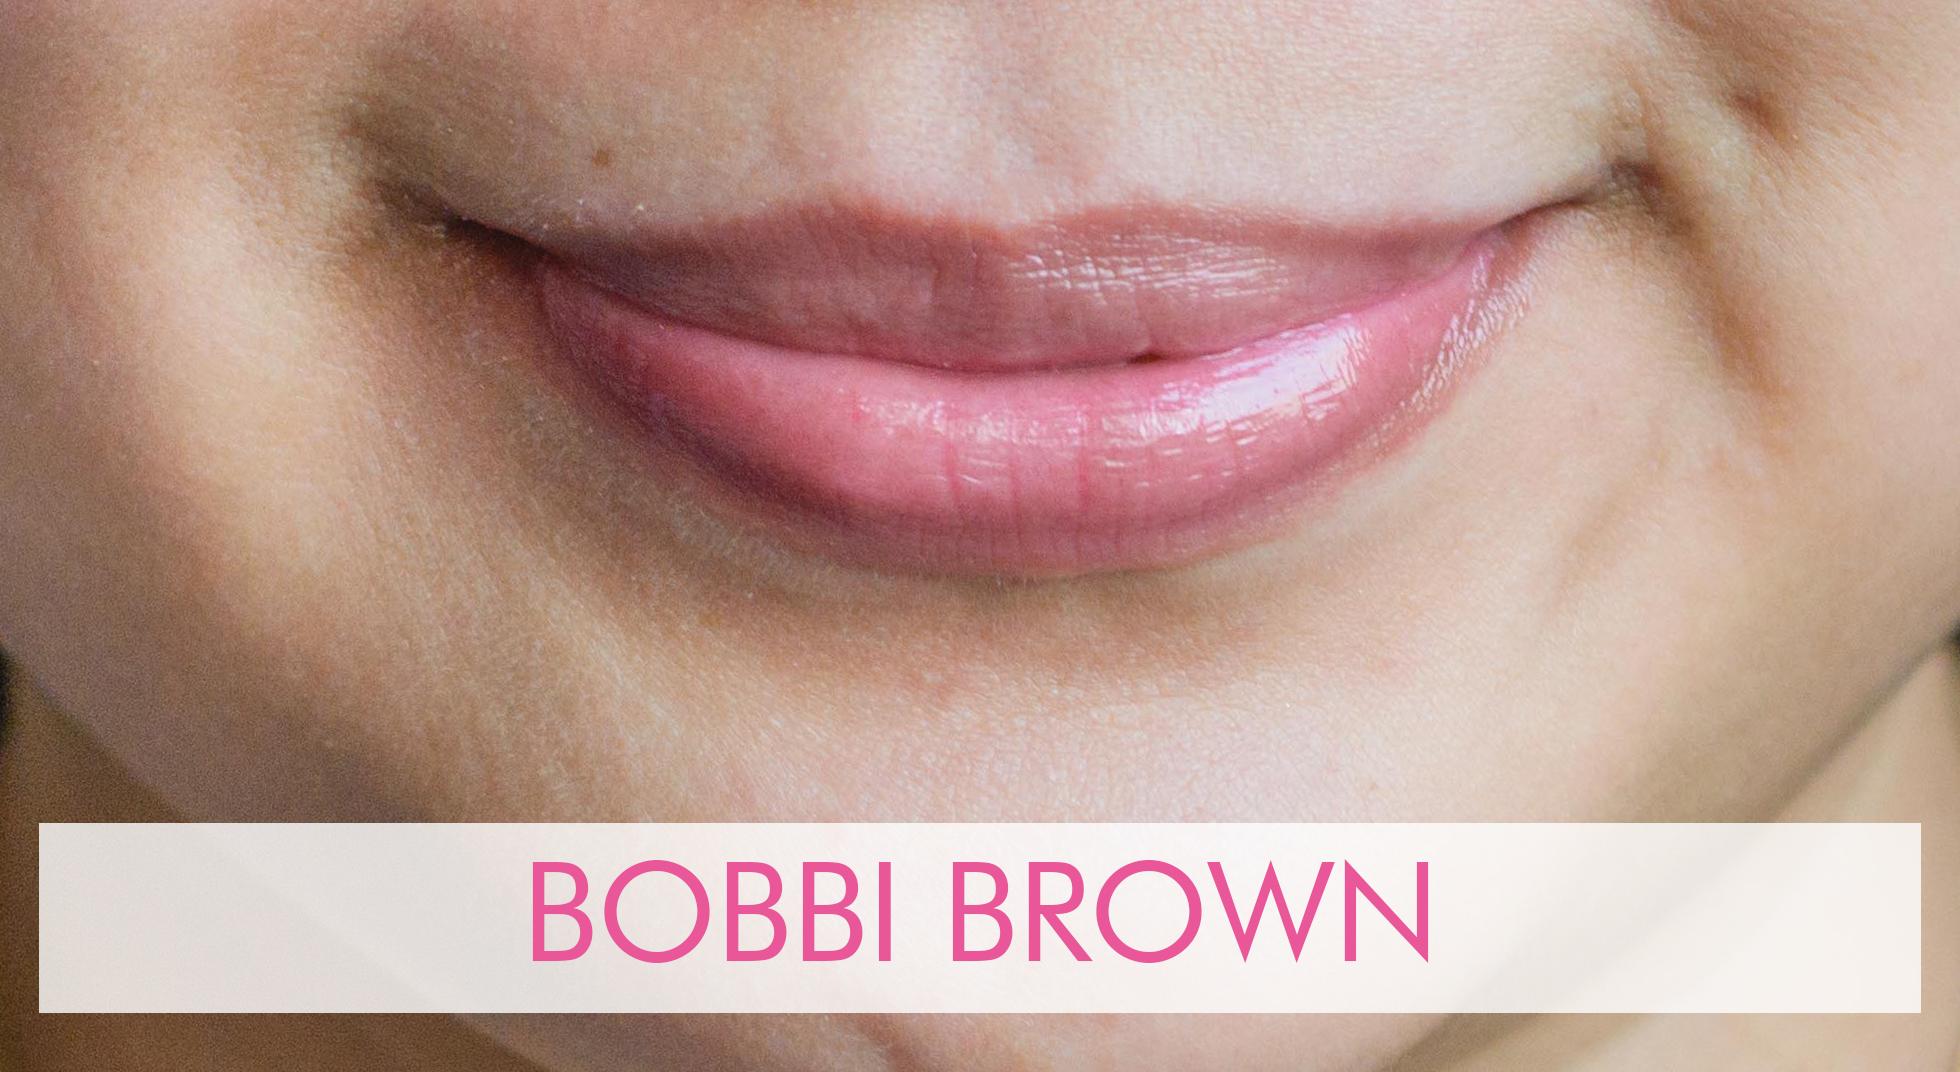 BOBBI-BROWN_tinted-lip-balms_nivea-revlon-burts-bees-canmake-make-up-for-ever-happy-skin-lip-ice-k-palette-bobbi-brown_review-philippines_2019.jpg